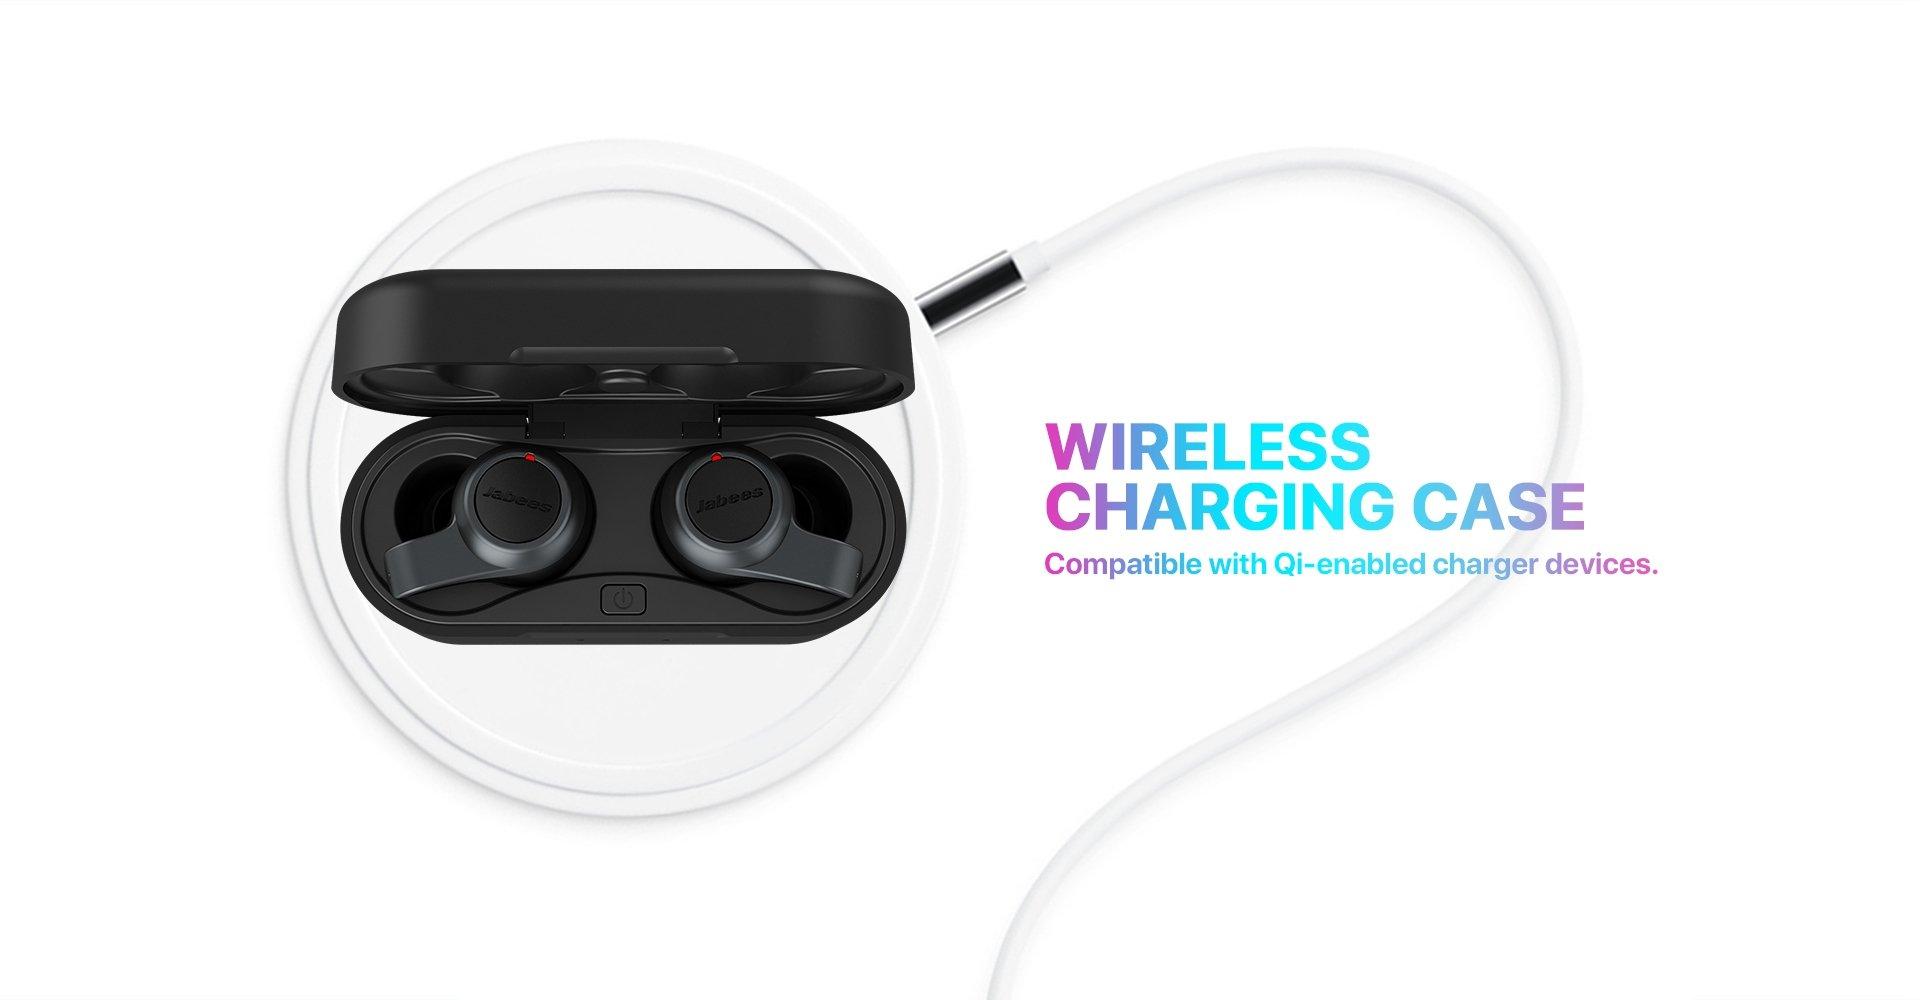 Jabees Firefly 2 Black Touch TWS Earbuds Waterproof & Dustproof IPX7 12